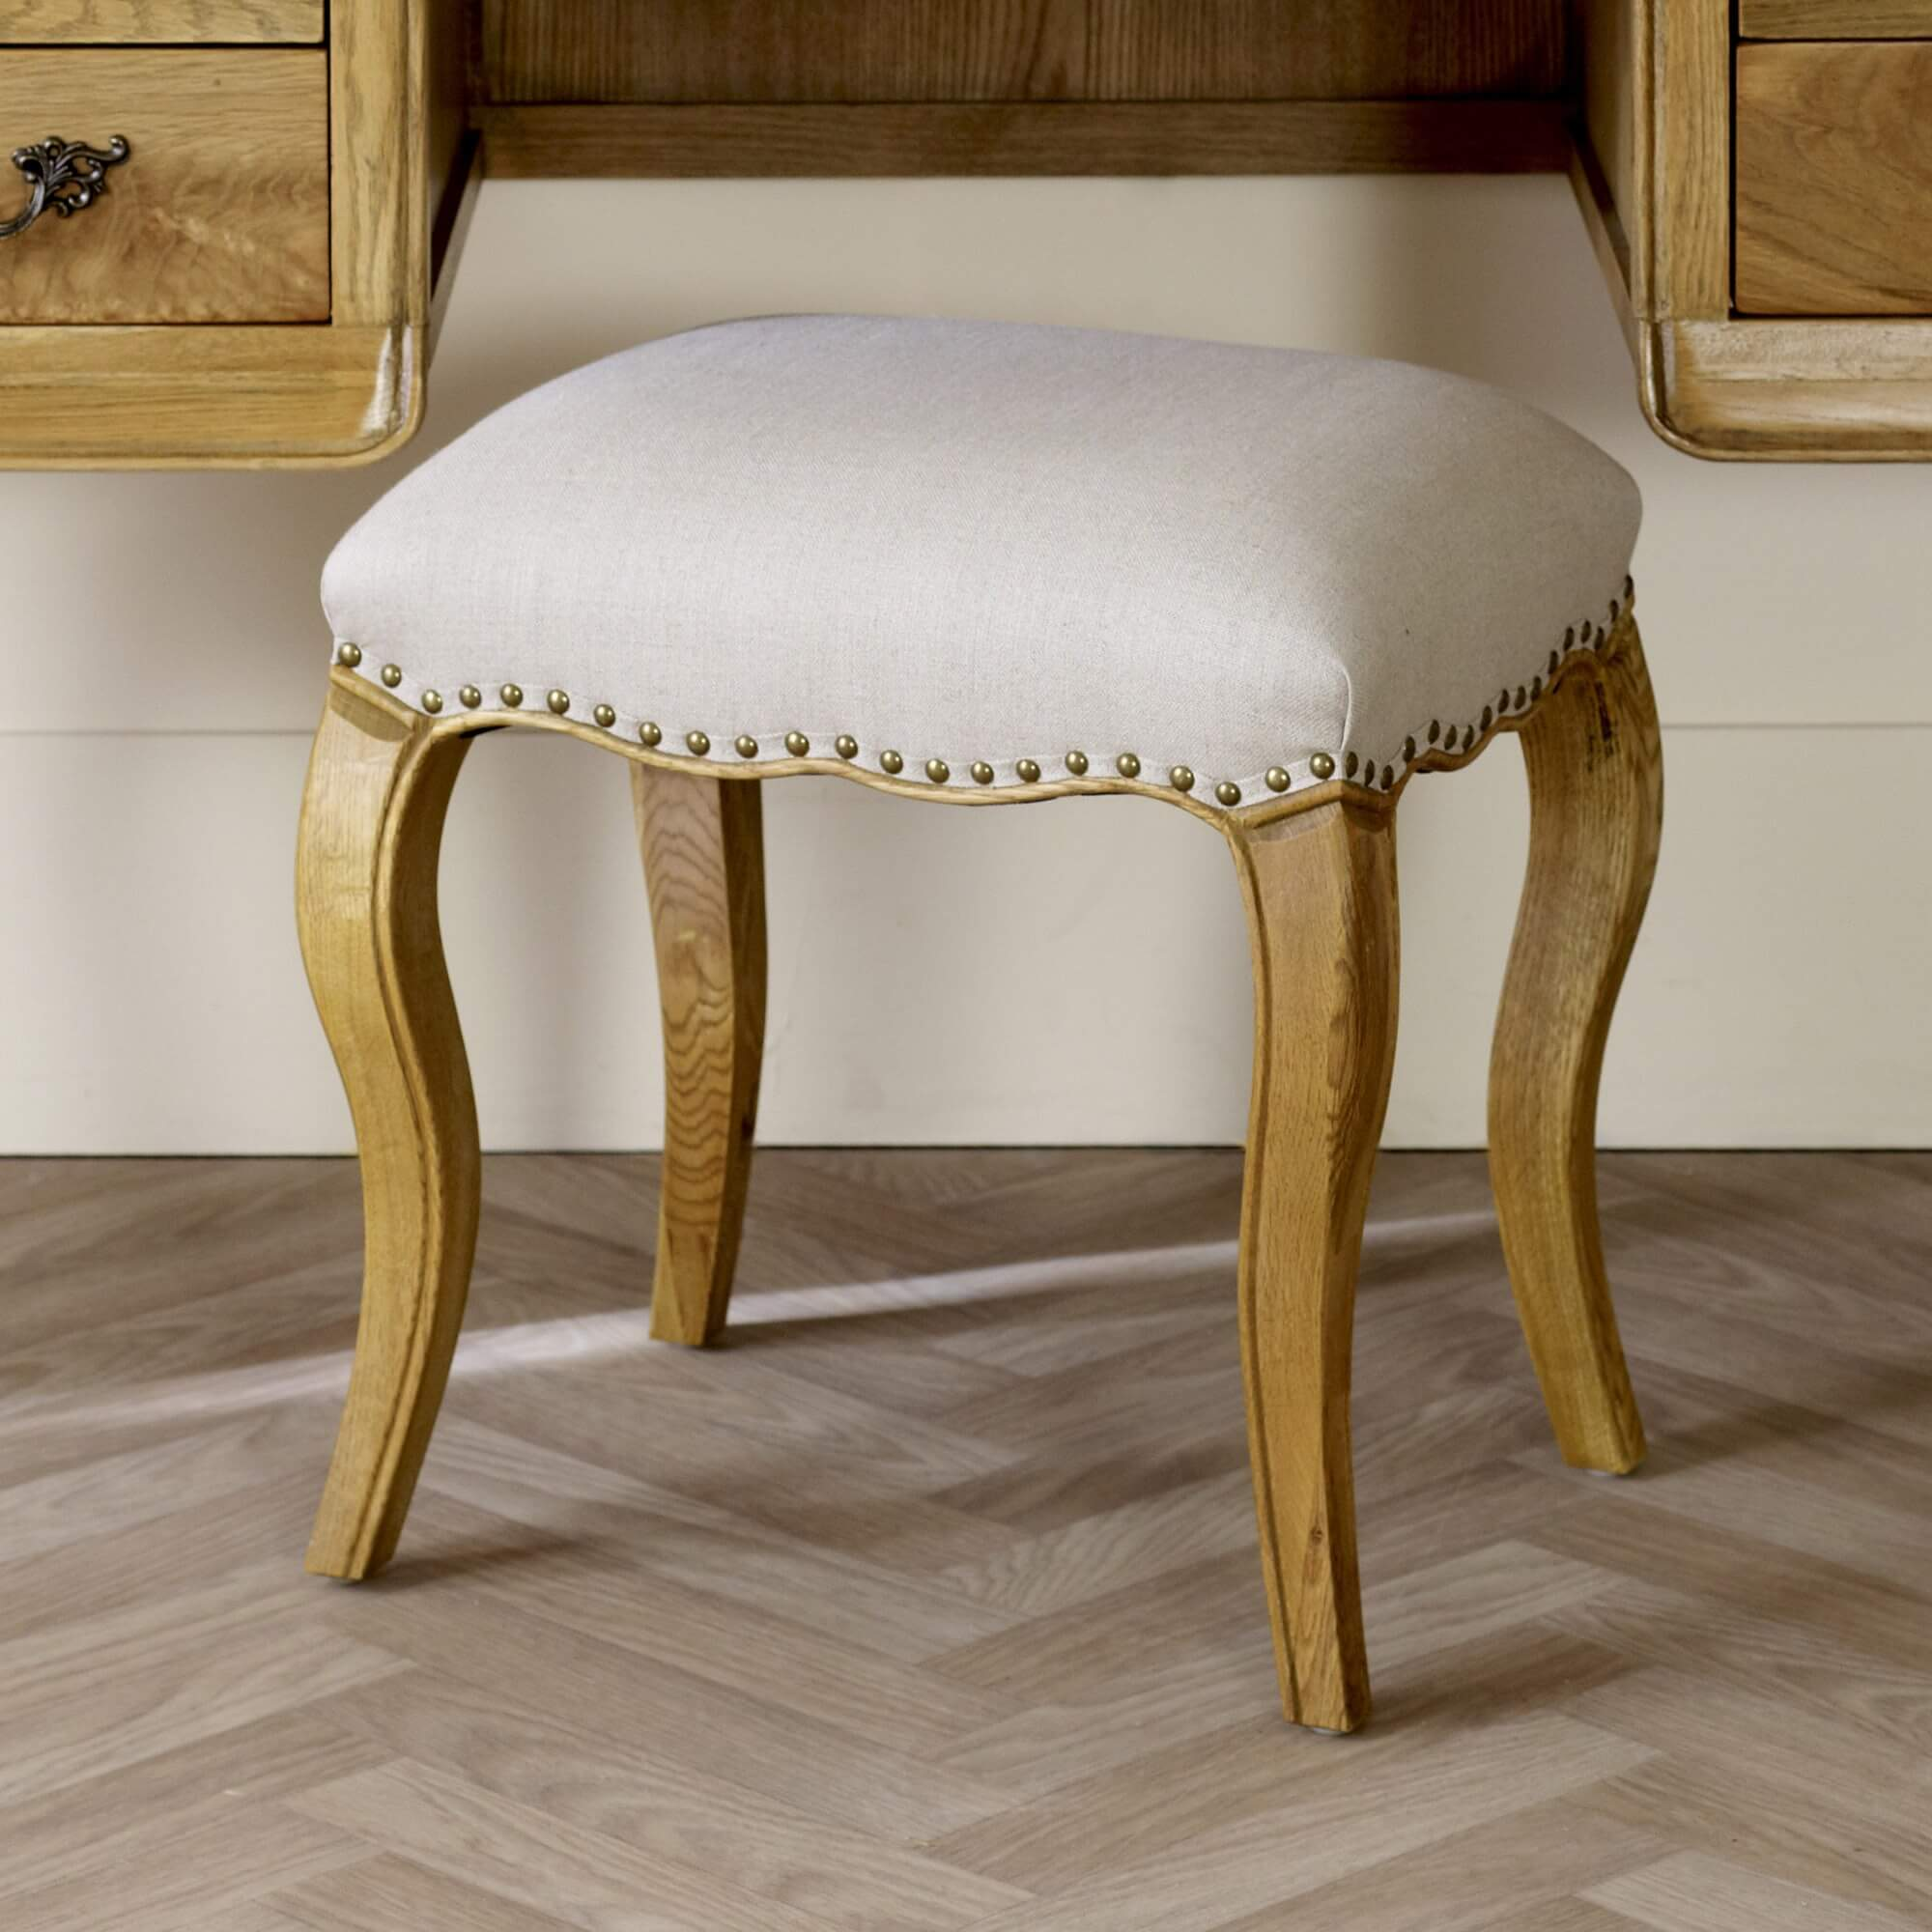 French Oak Dressing Table Stool